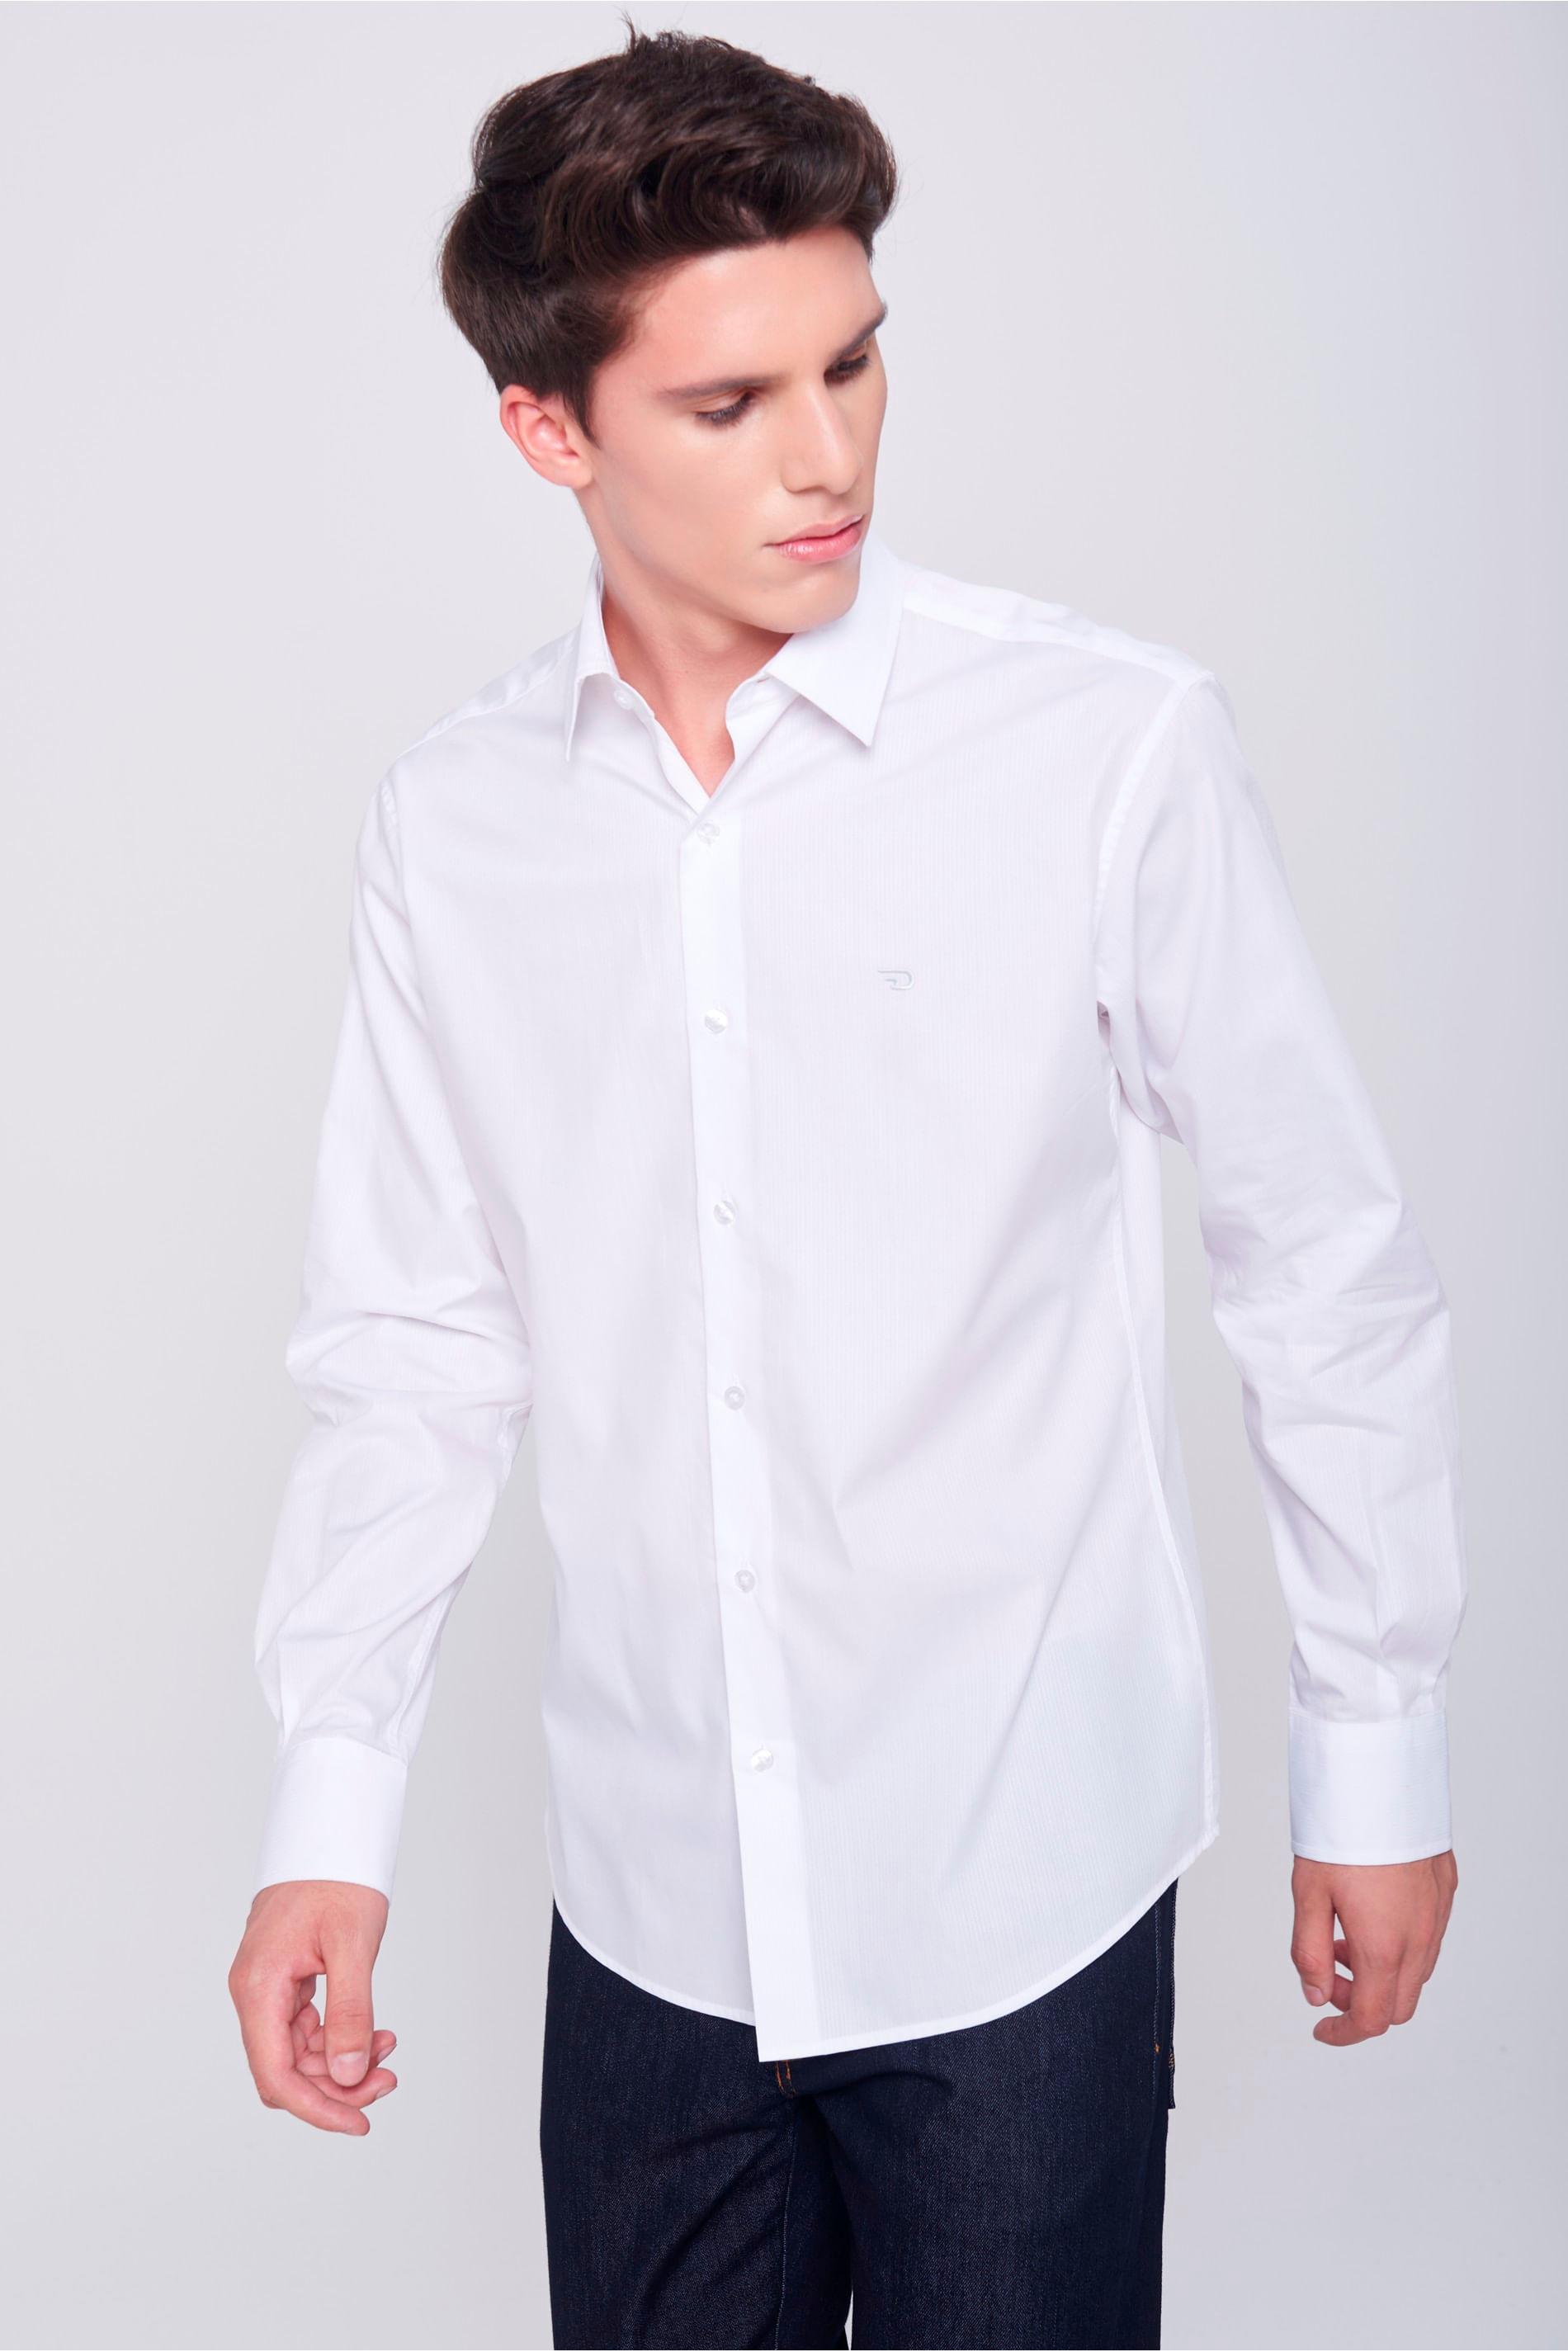 Damyller · Moda Masculina · Camisa · Manga Longa. abrir 9a51b9ec853d6